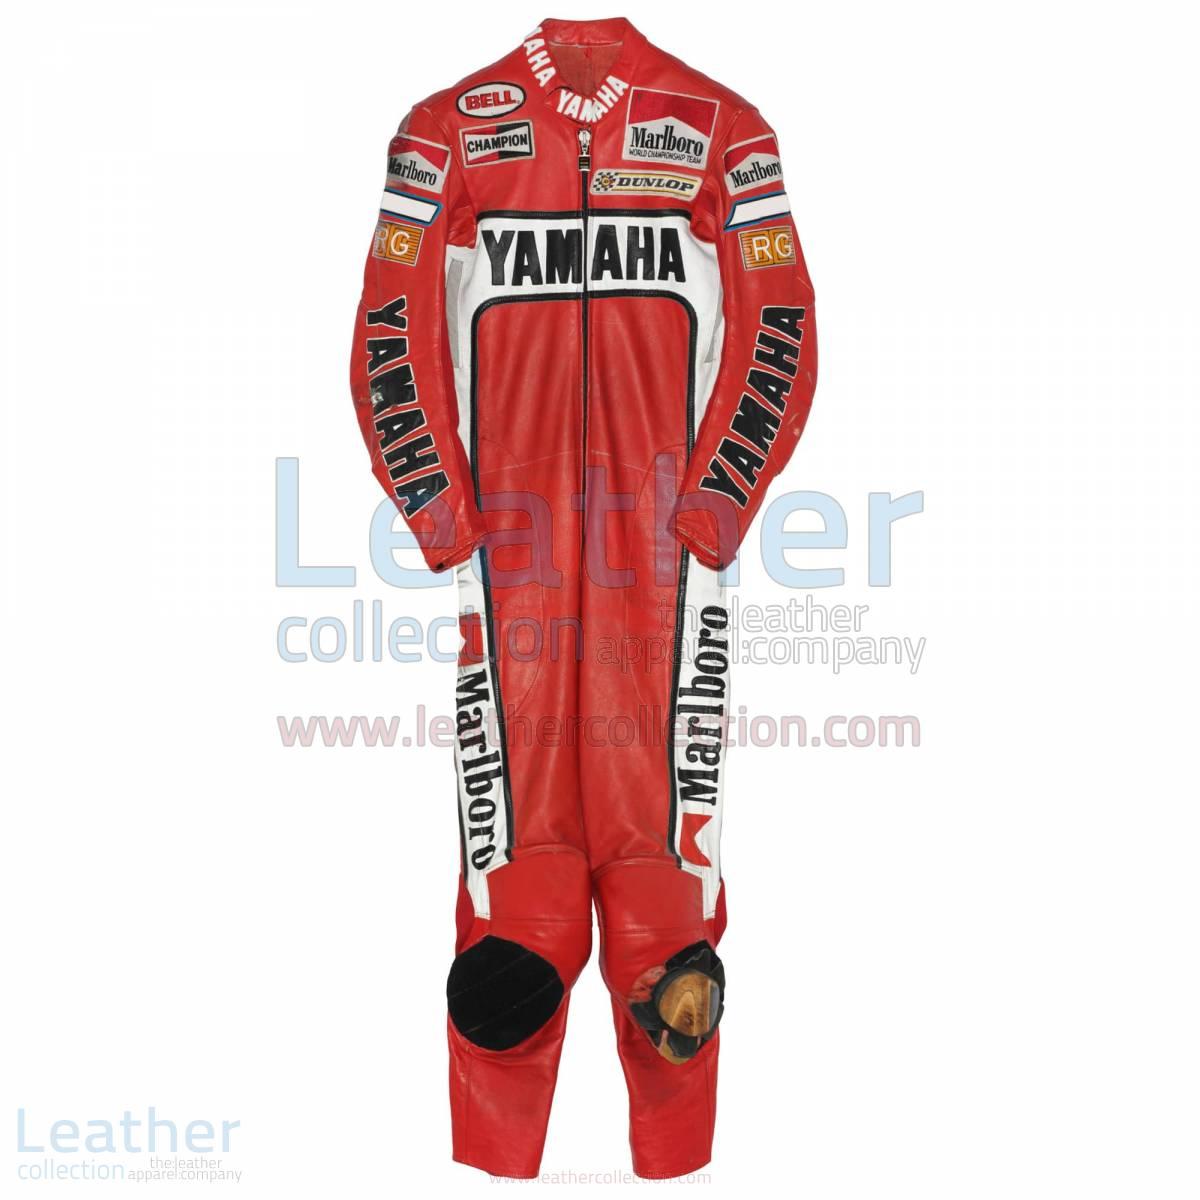 yamaha apparel